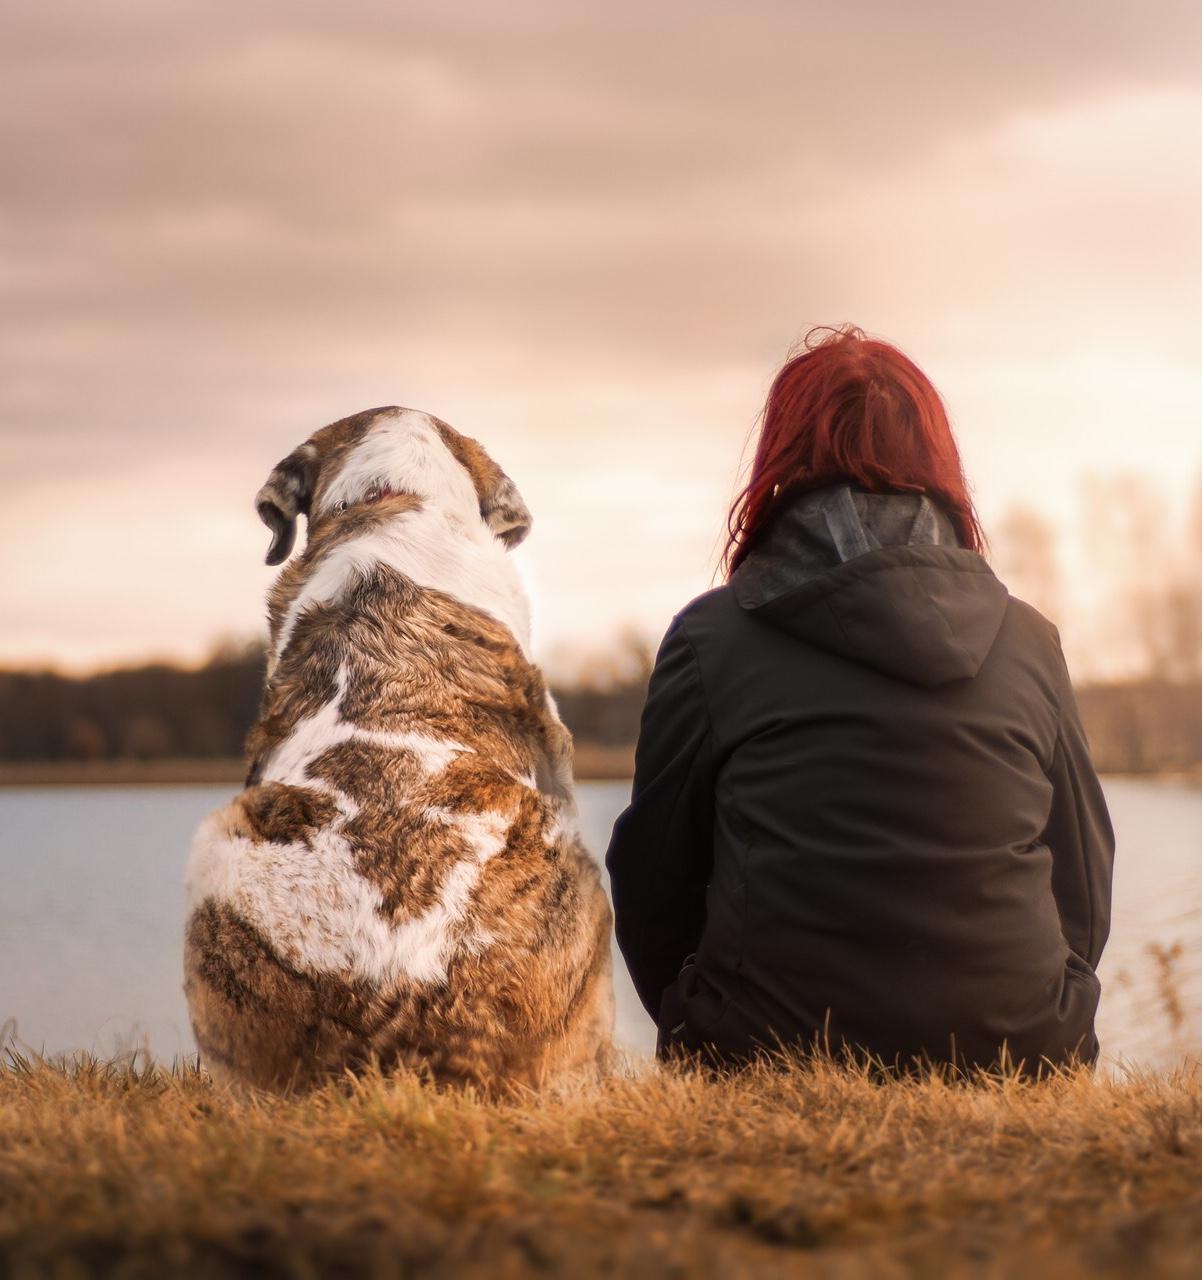 Hero-dog-story-suzanne-winterly.jpg